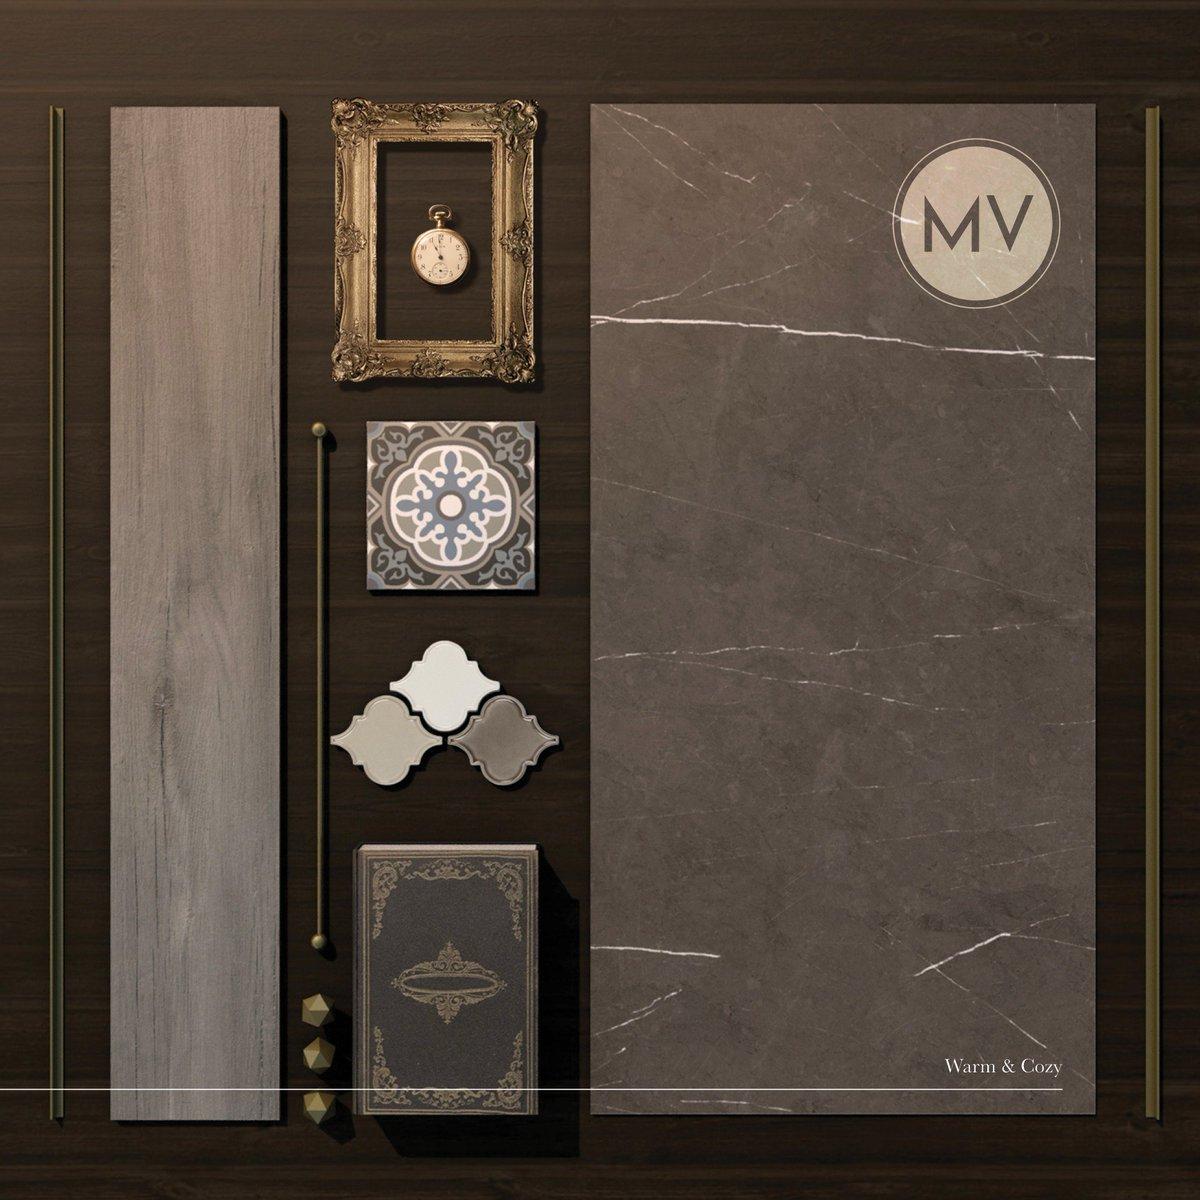 Stone Art Mocha Classic Arabesque Mood And Picasso Buchra MosaicoVero MVSA Warm Cozy Friyay FridayFunday Antique Decor Decortile Tile Mosaic